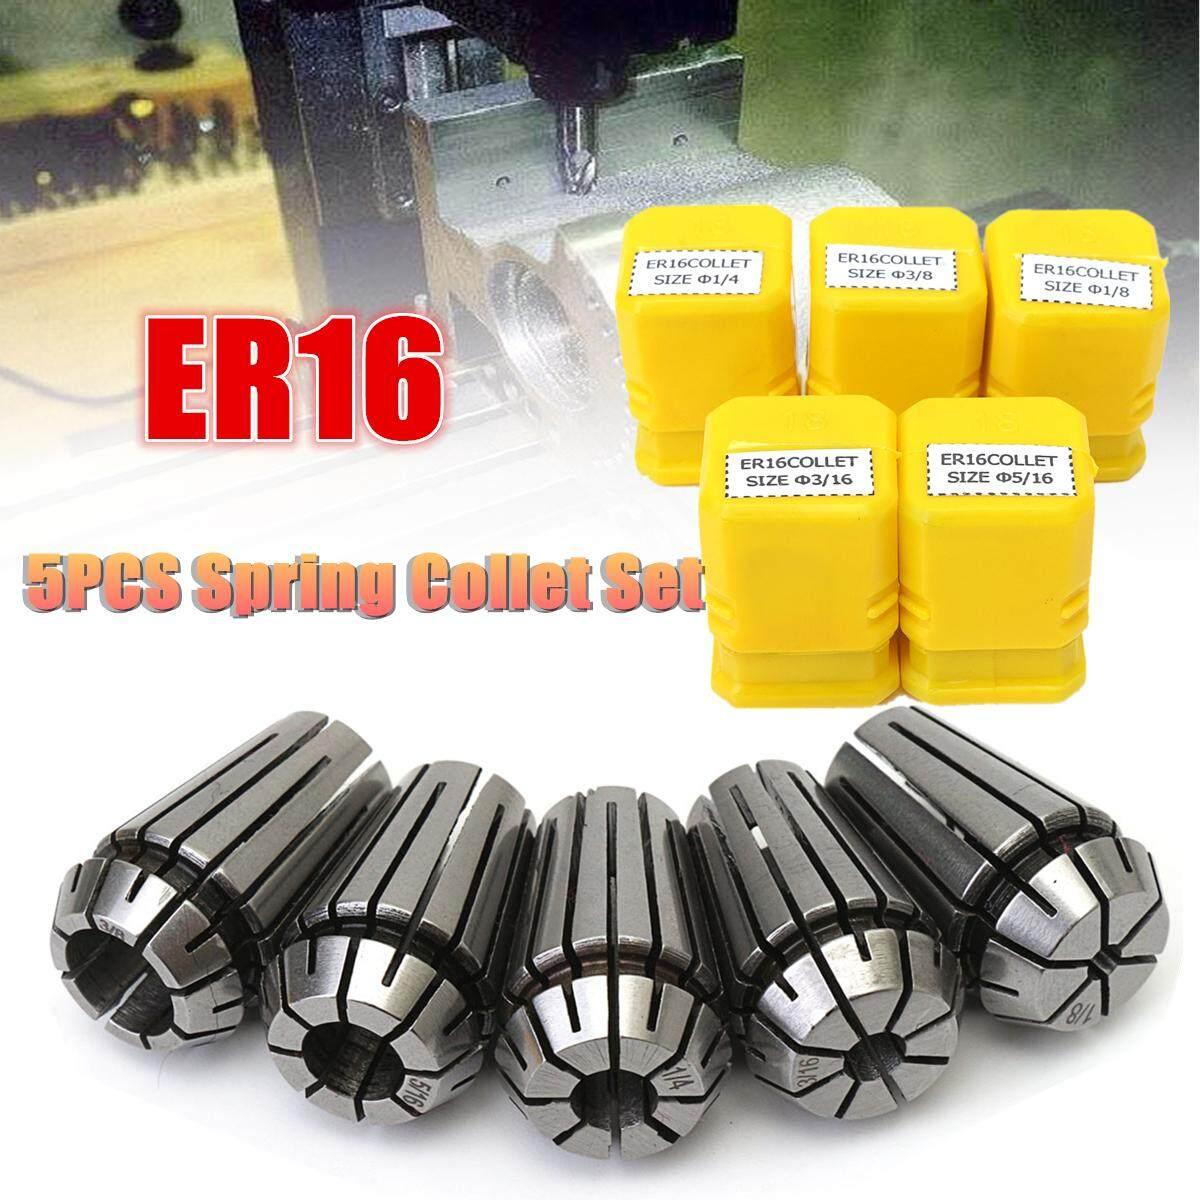 5Pcs ER16 1/8-3/8 Spring Collet Set for CNC Milling Engraving Machine Lathe